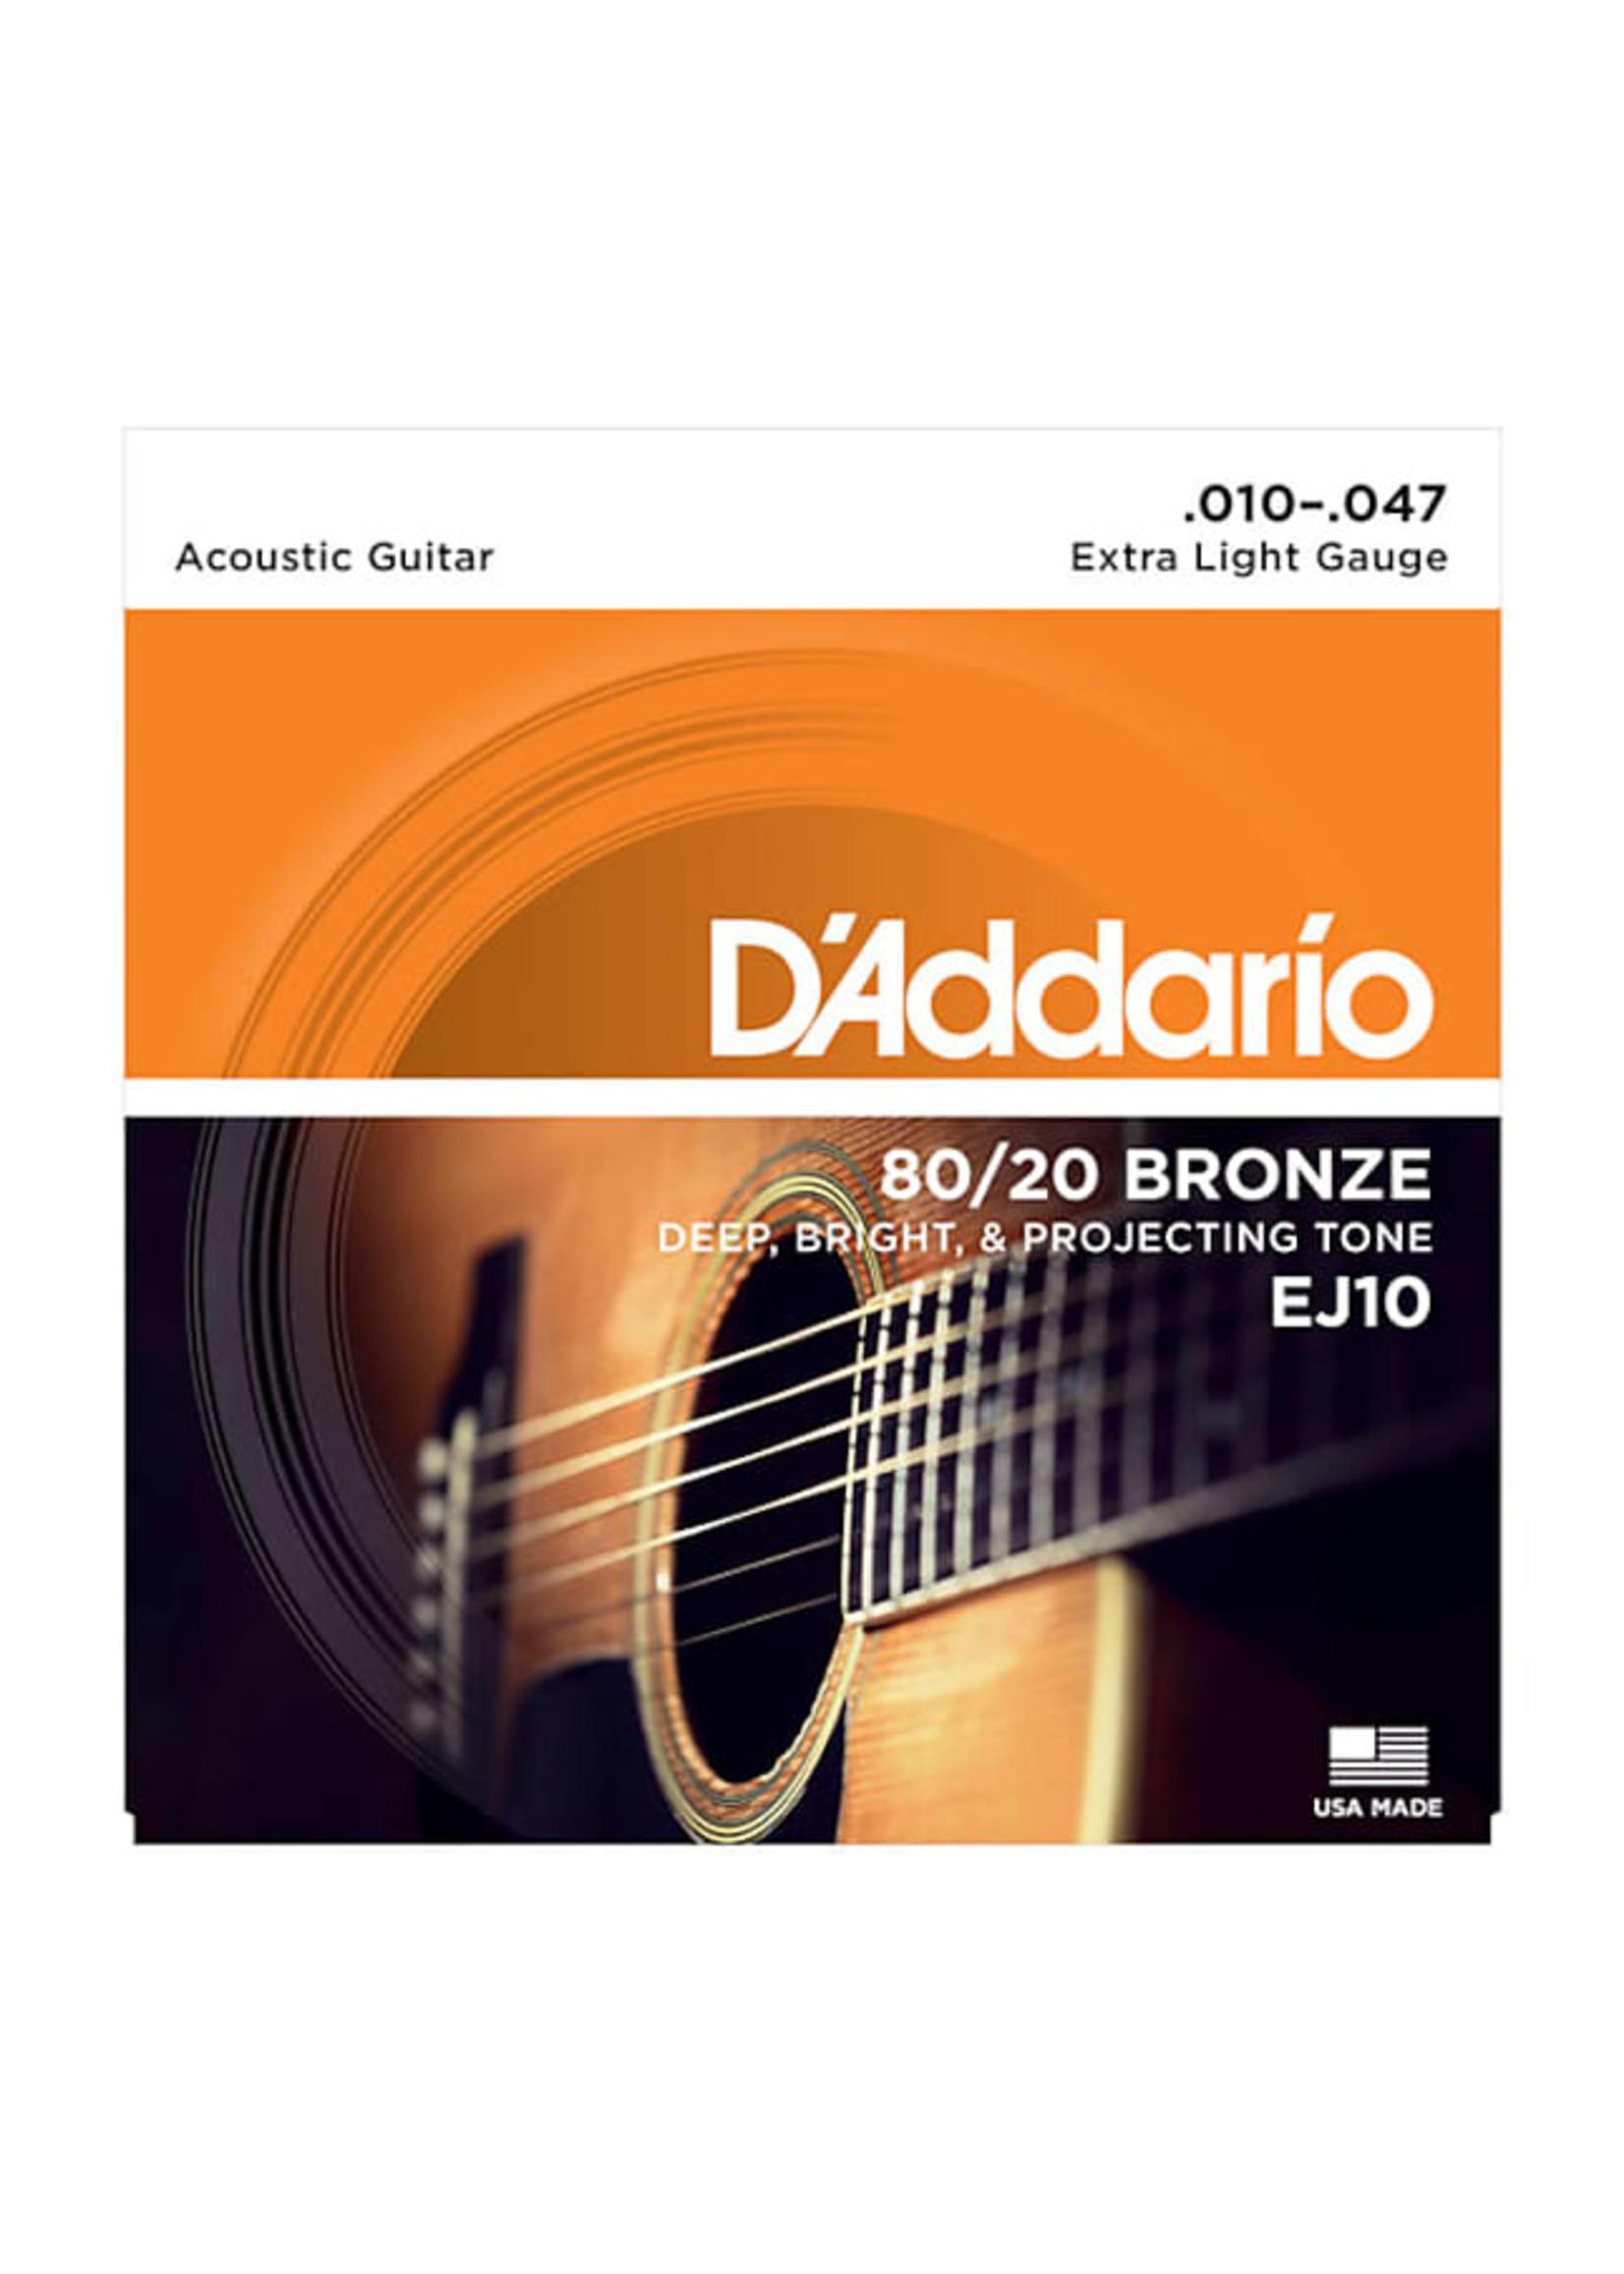 D'Addario D'Addario EJ10 80/20 Bronze Acoustic Guitar Strings, Extra Light, 10-47